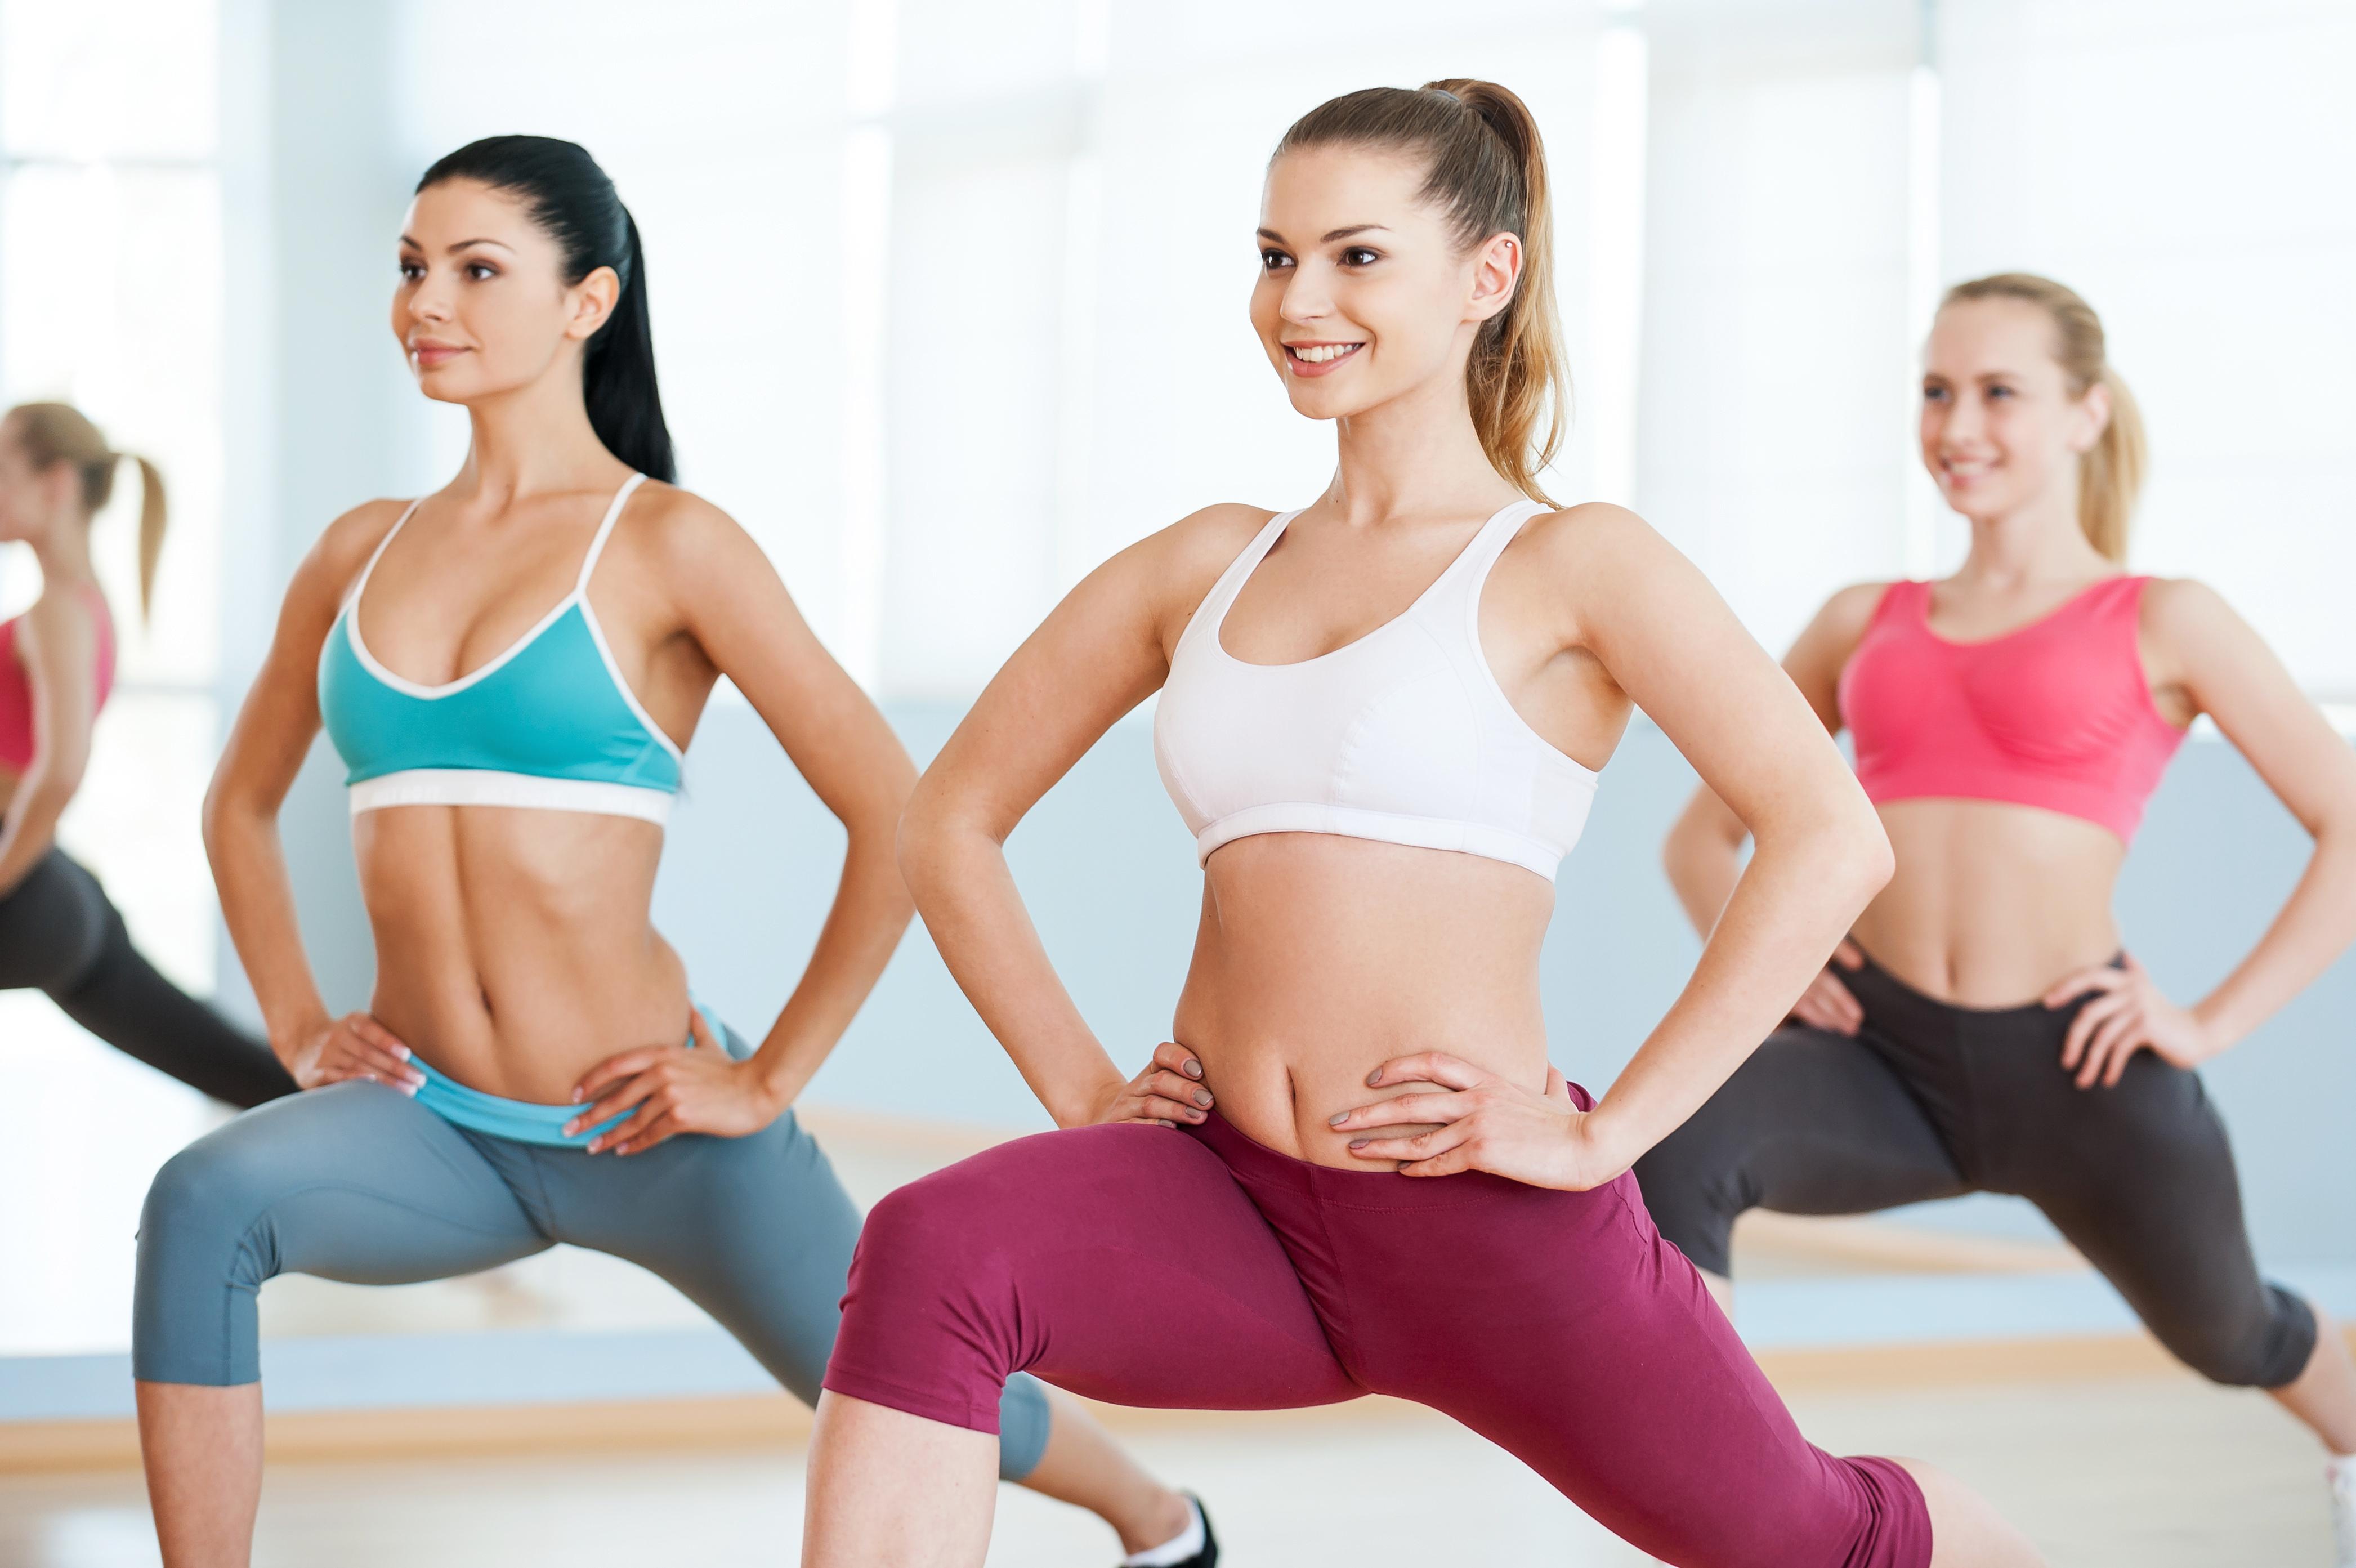 Виды Фитнес Для Похудения. Фитнес для похудения — что выбрать?